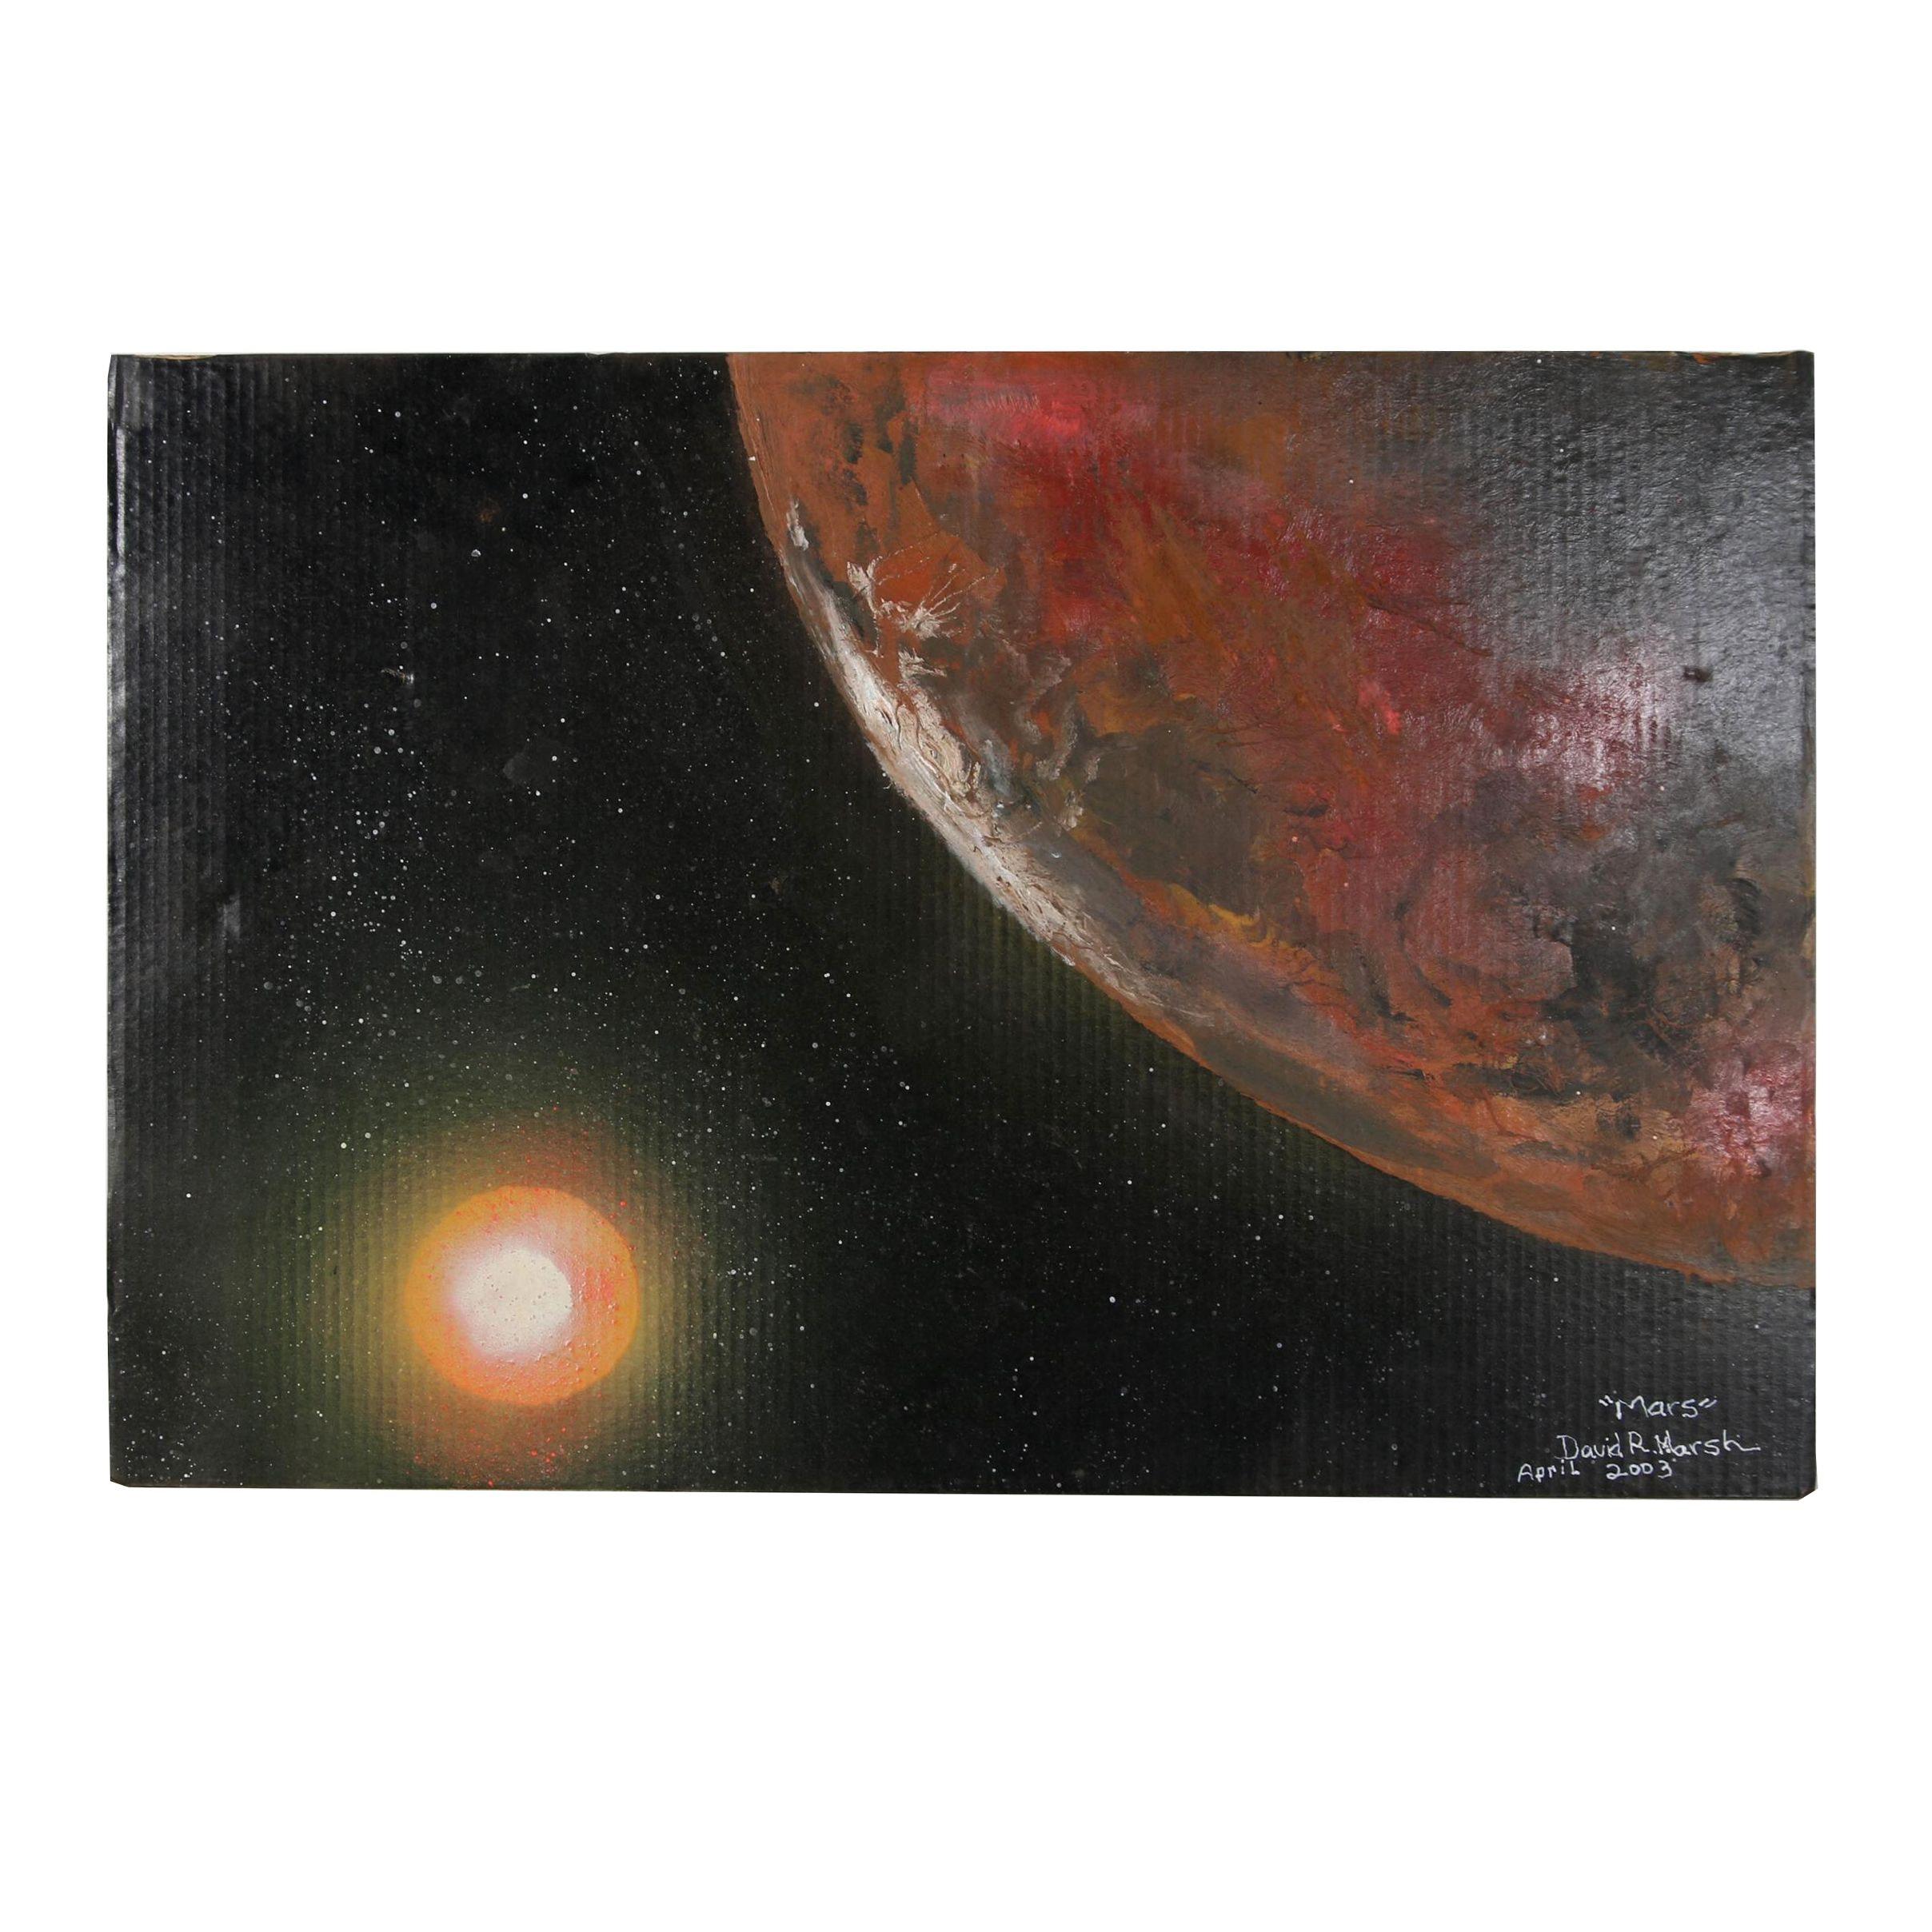 "David R. Marsh 2003 Mixed Media Painting ""Mars"""